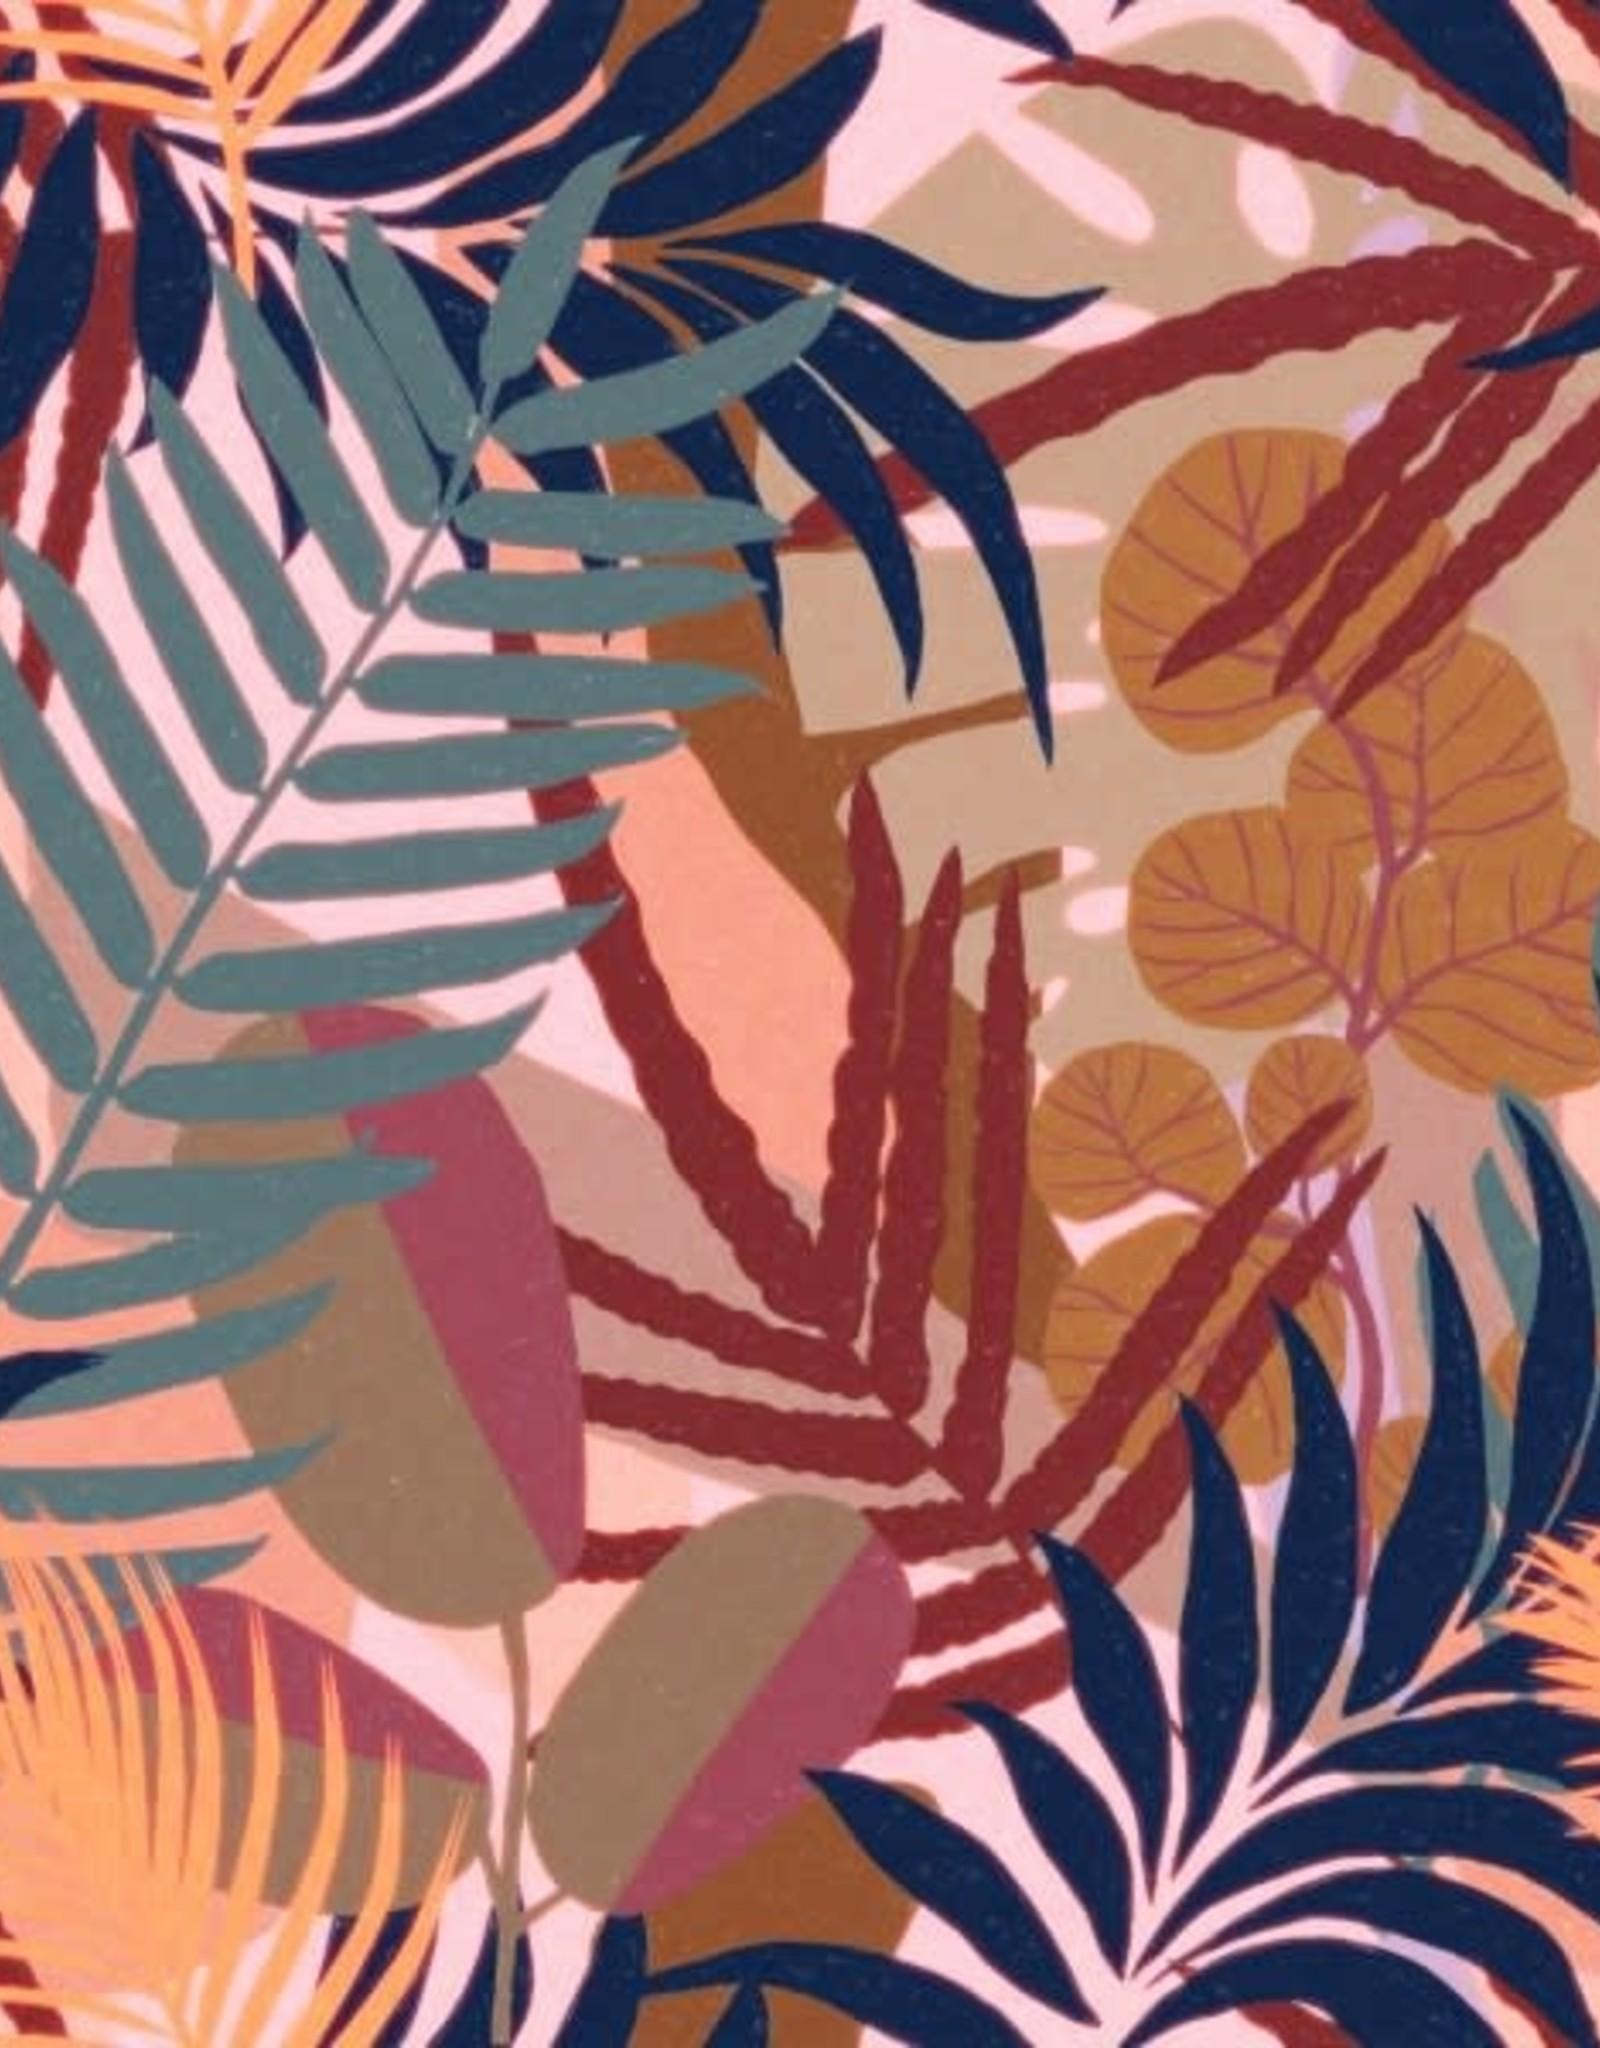 Behang Jardin Del Sol - 156 x 300 cm